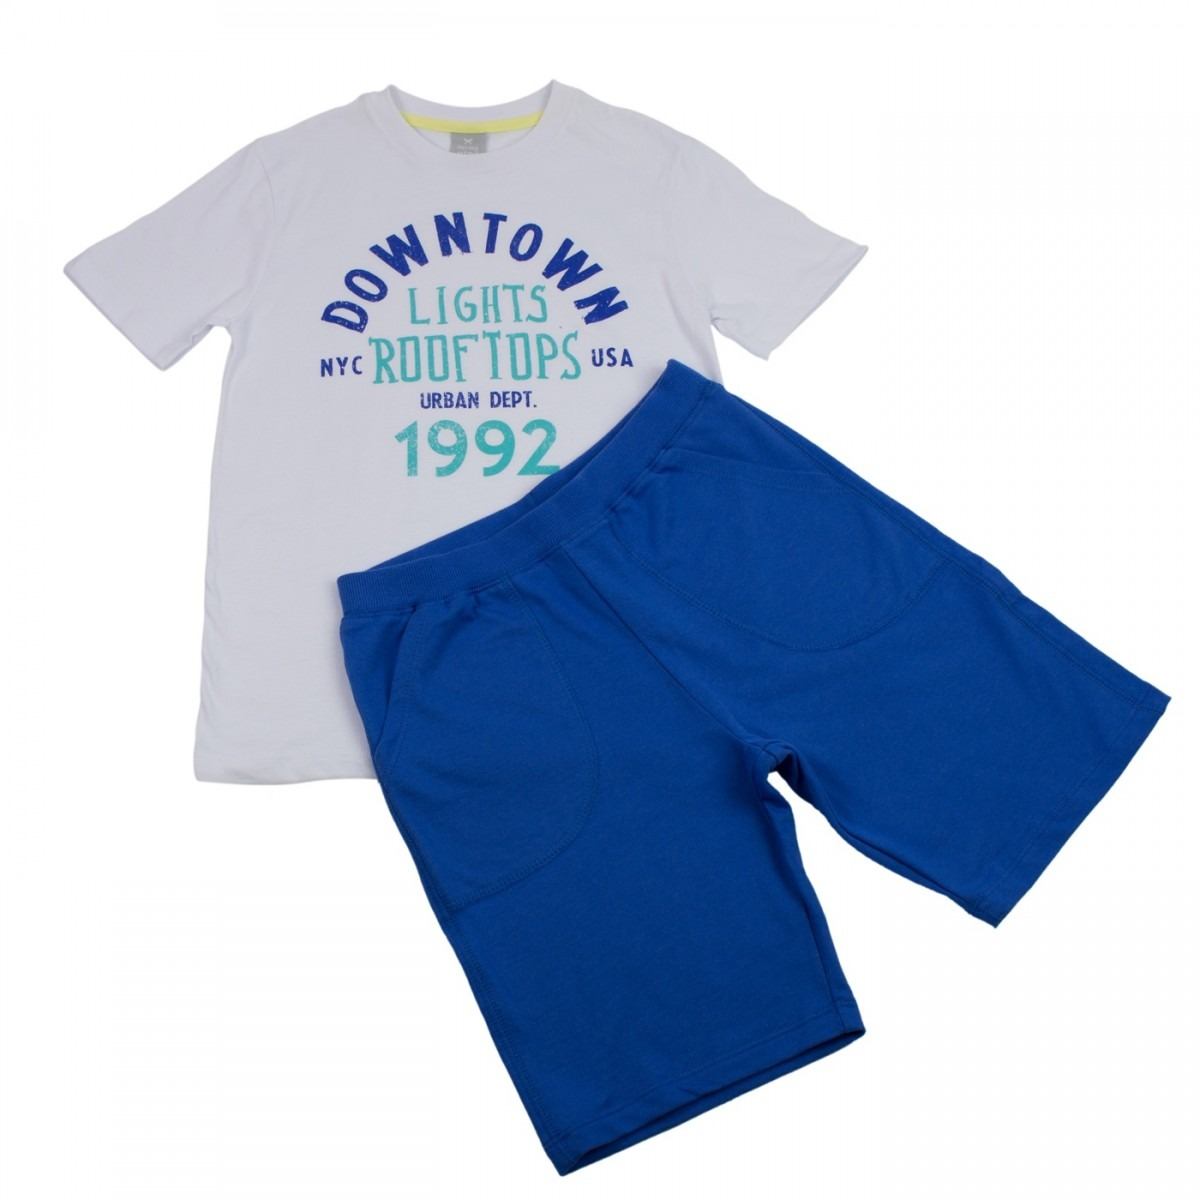 5a7727e5eaf99 conjunto infantil masculino hering kids camiseta e bermuda. Carregando zoom.